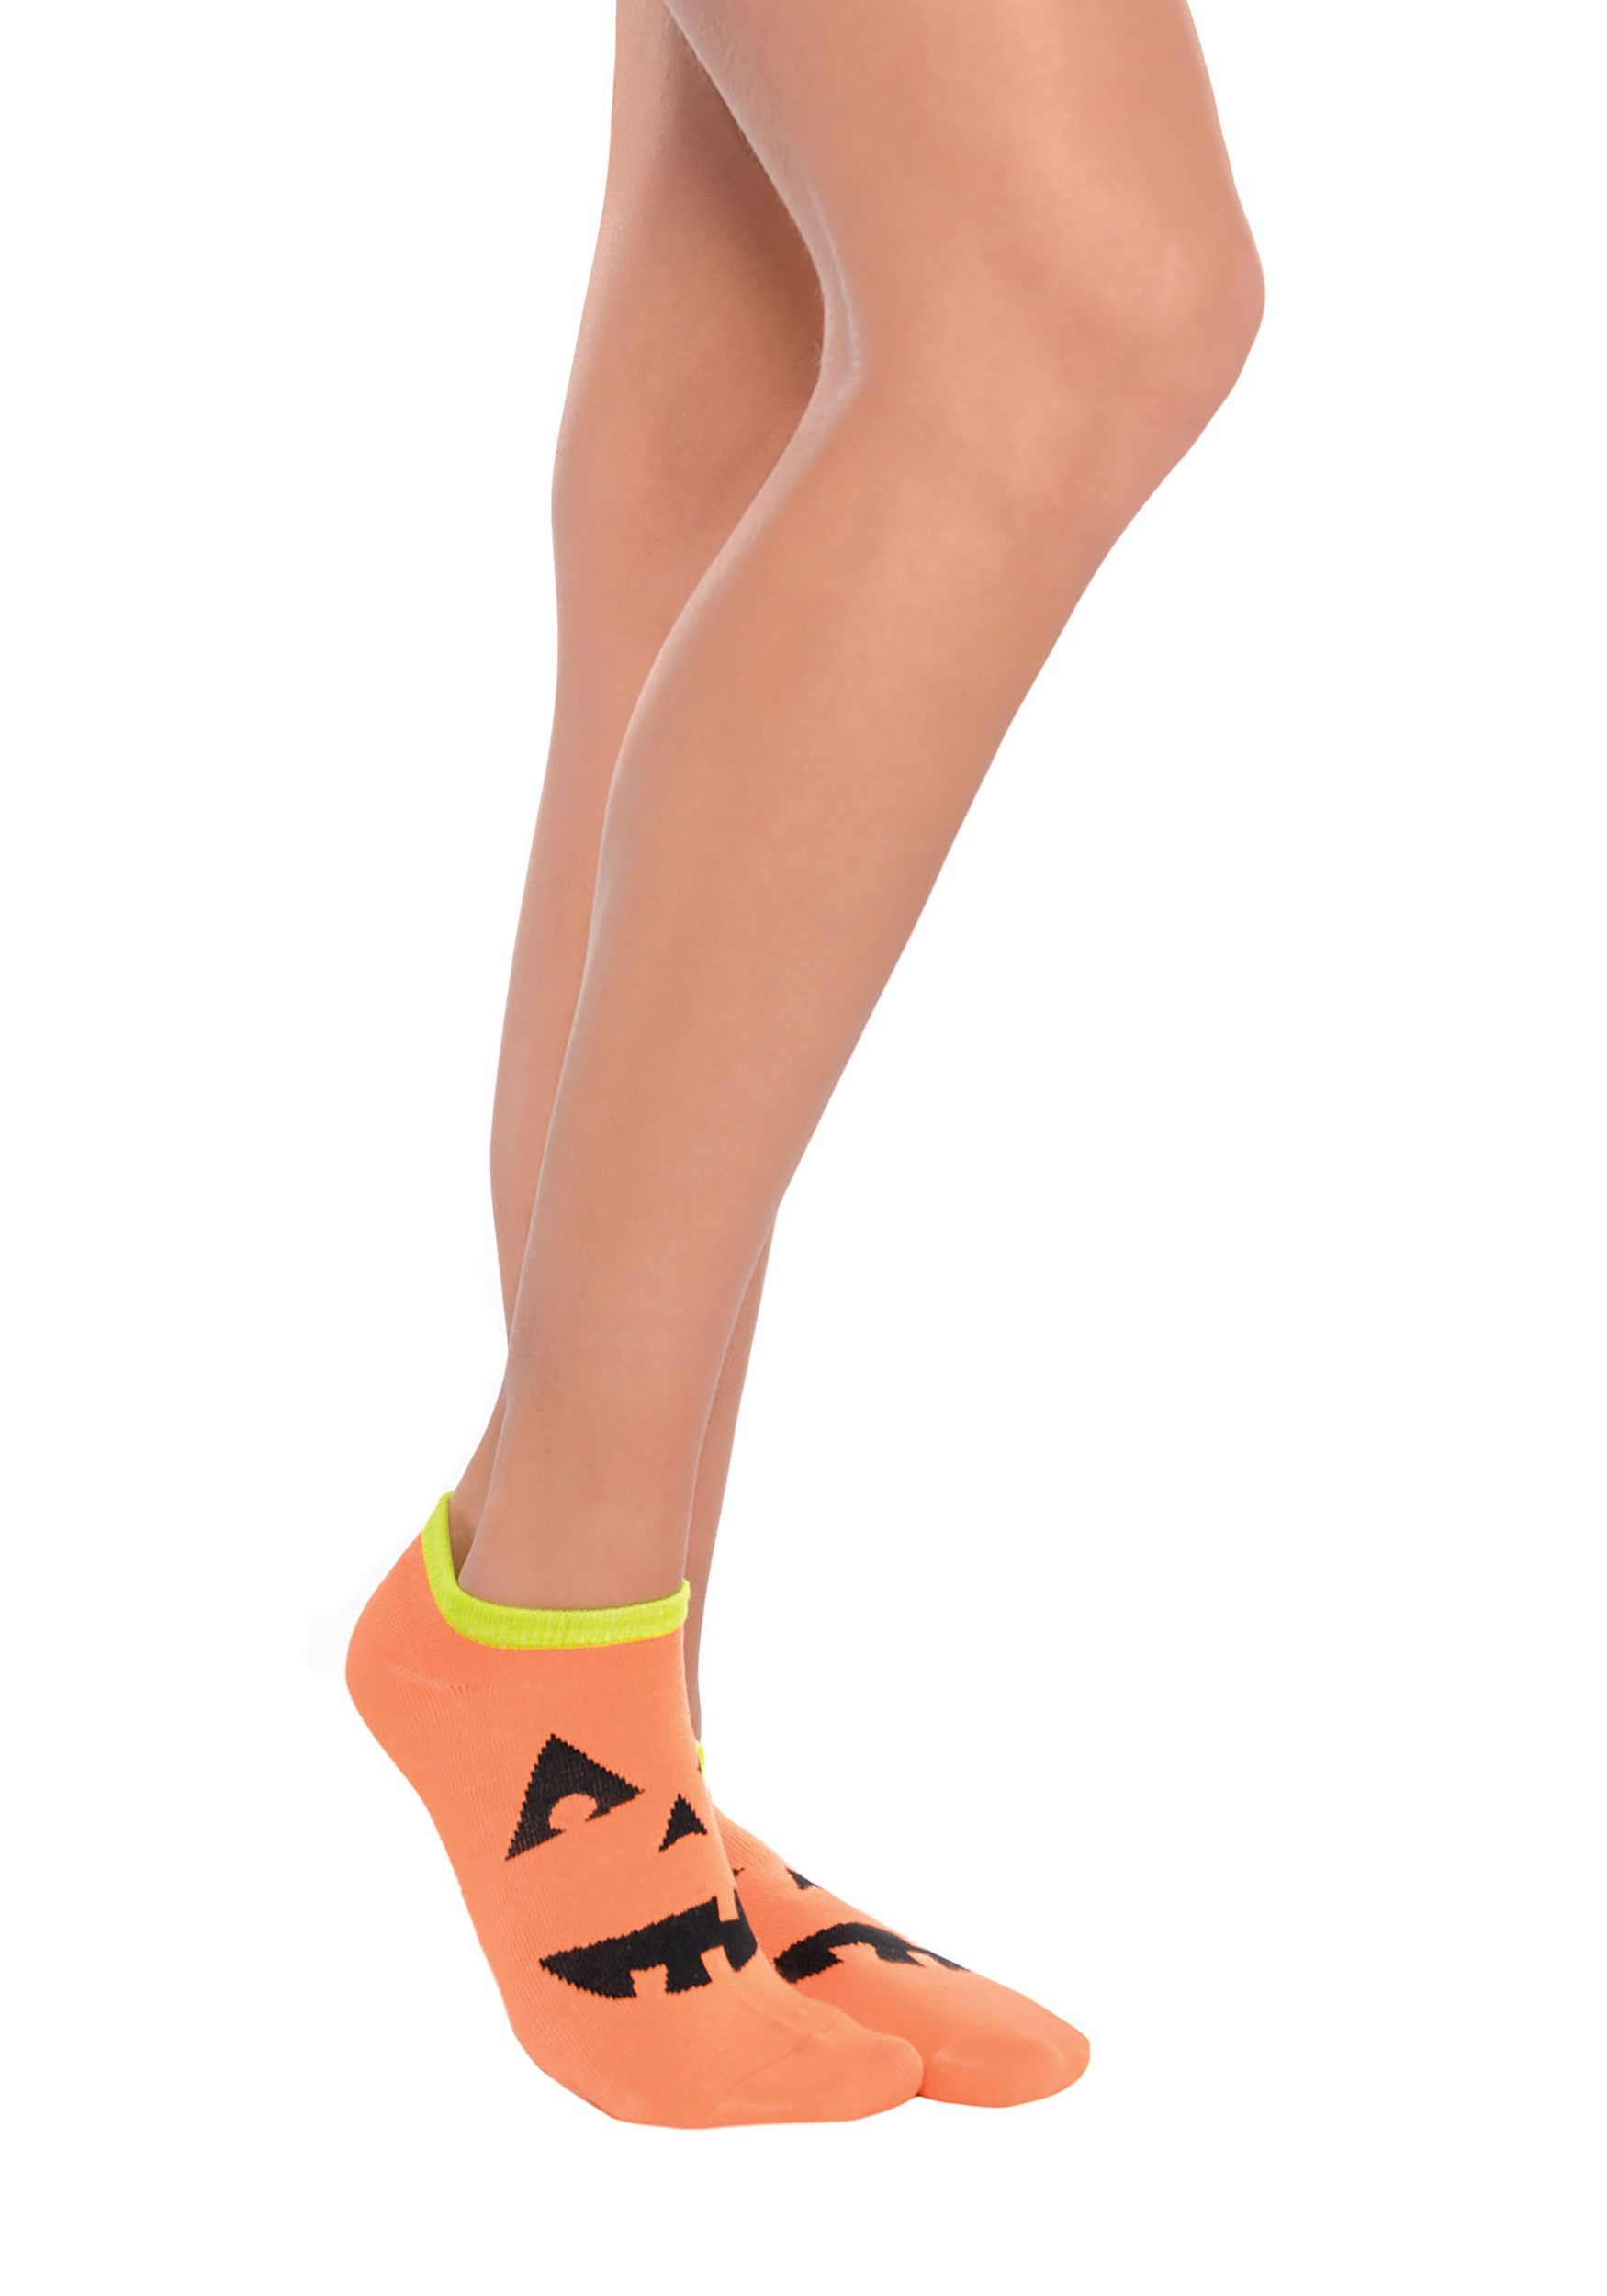 Jack_O_Lantern_Ankle_Socks